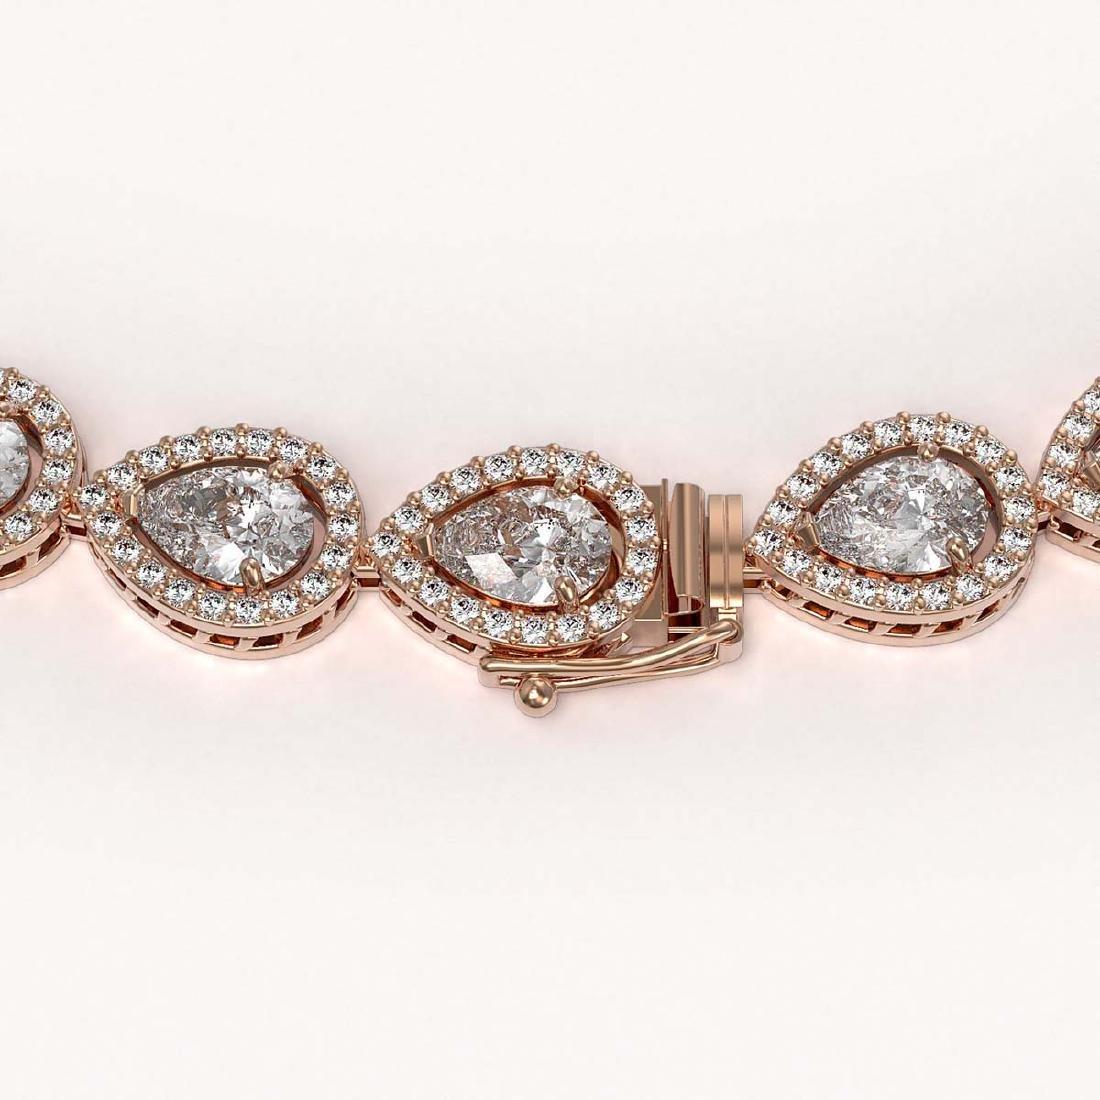 33.08 CTW Pear Diamond Designer Necklace 18K Rose Gold - 3